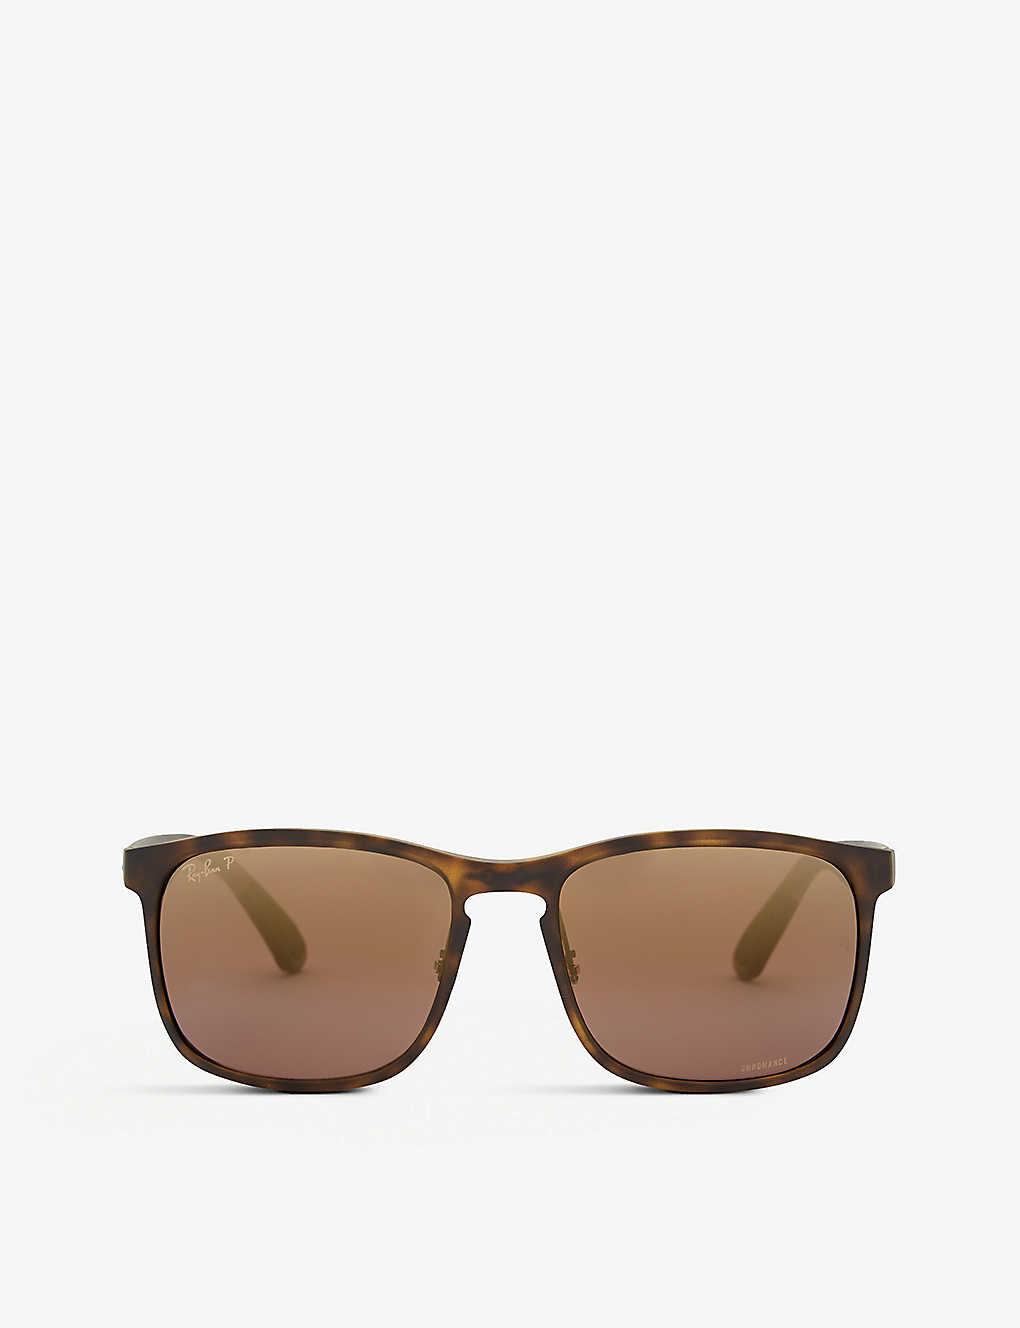 209eb14cfb RAY-BAN - RB4264 Chromance® Havana square-frame sunglasses ...